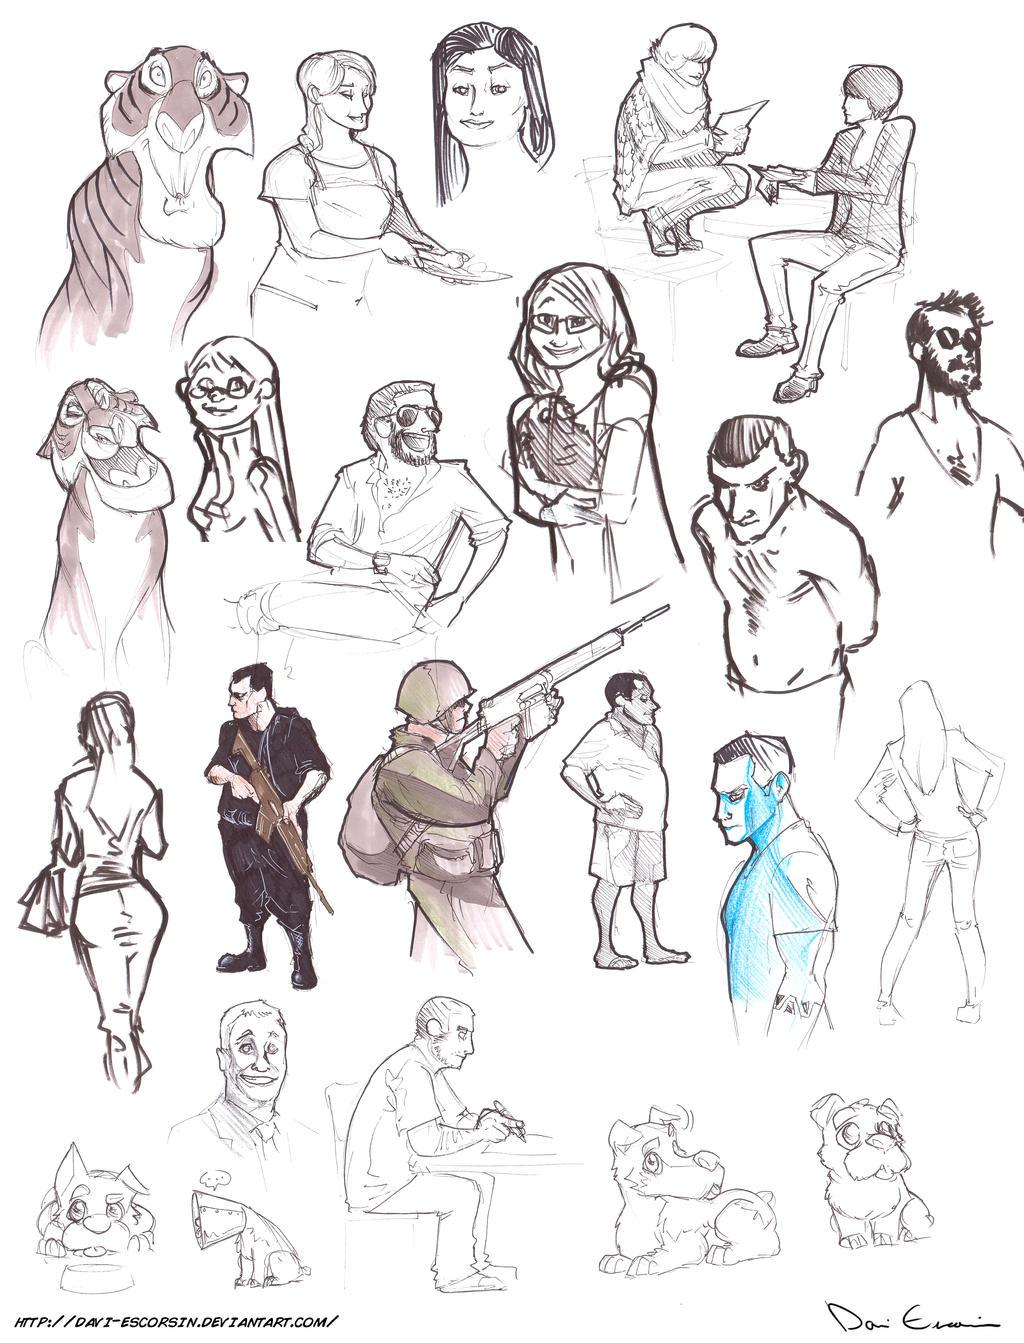 Character Design Sketchbook : Sketch dump fundamentals of character design by davi